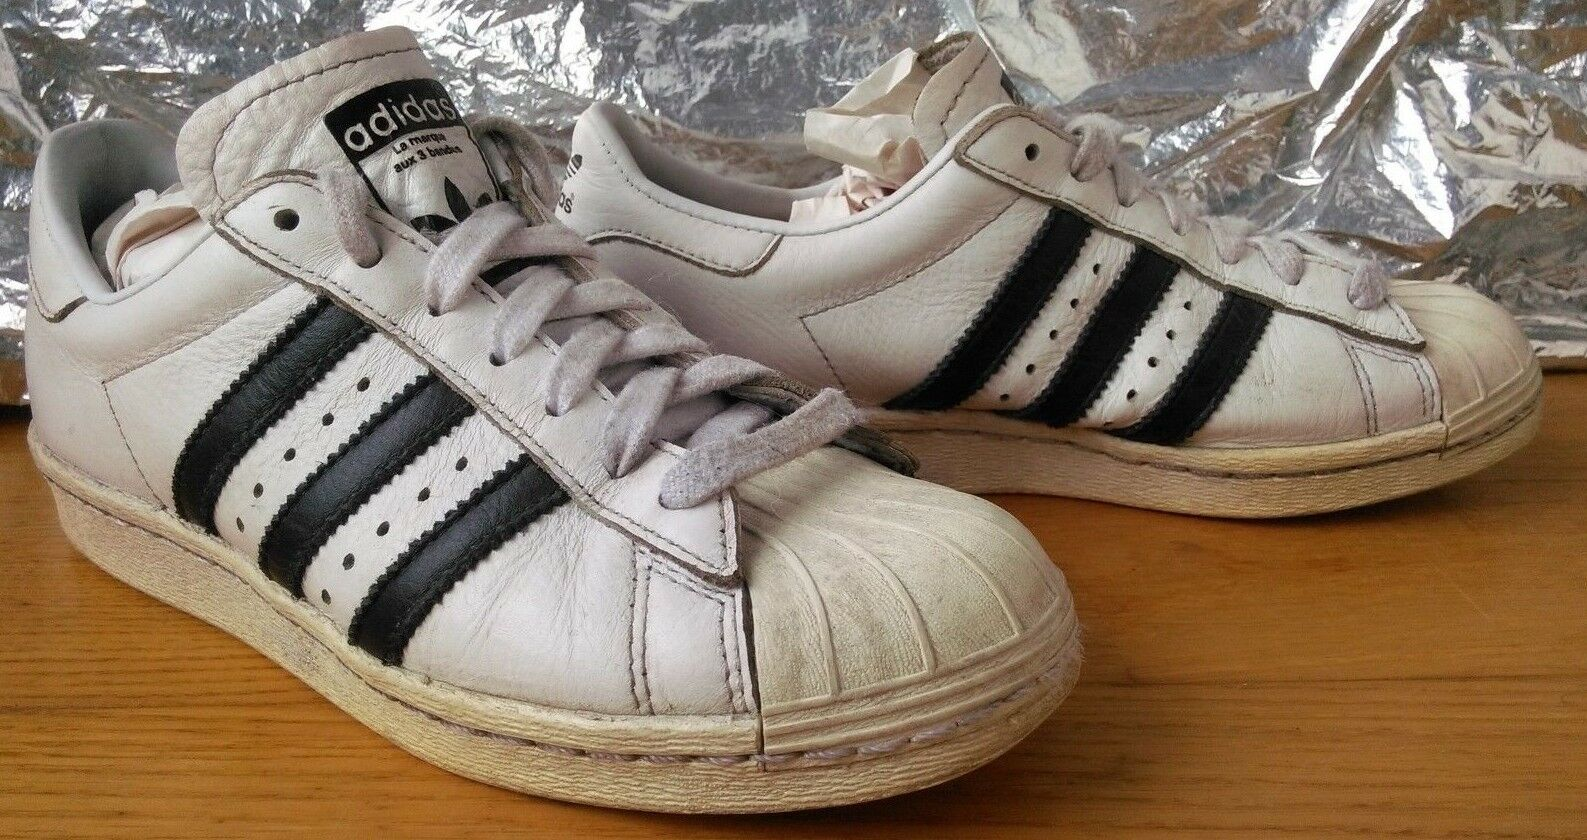 finest selection 1eb00 830a7 Adidas Star Star Star Wars Shell Toe formadores 3 Stripes Cuero Retro  Vintage moda Reino Unido